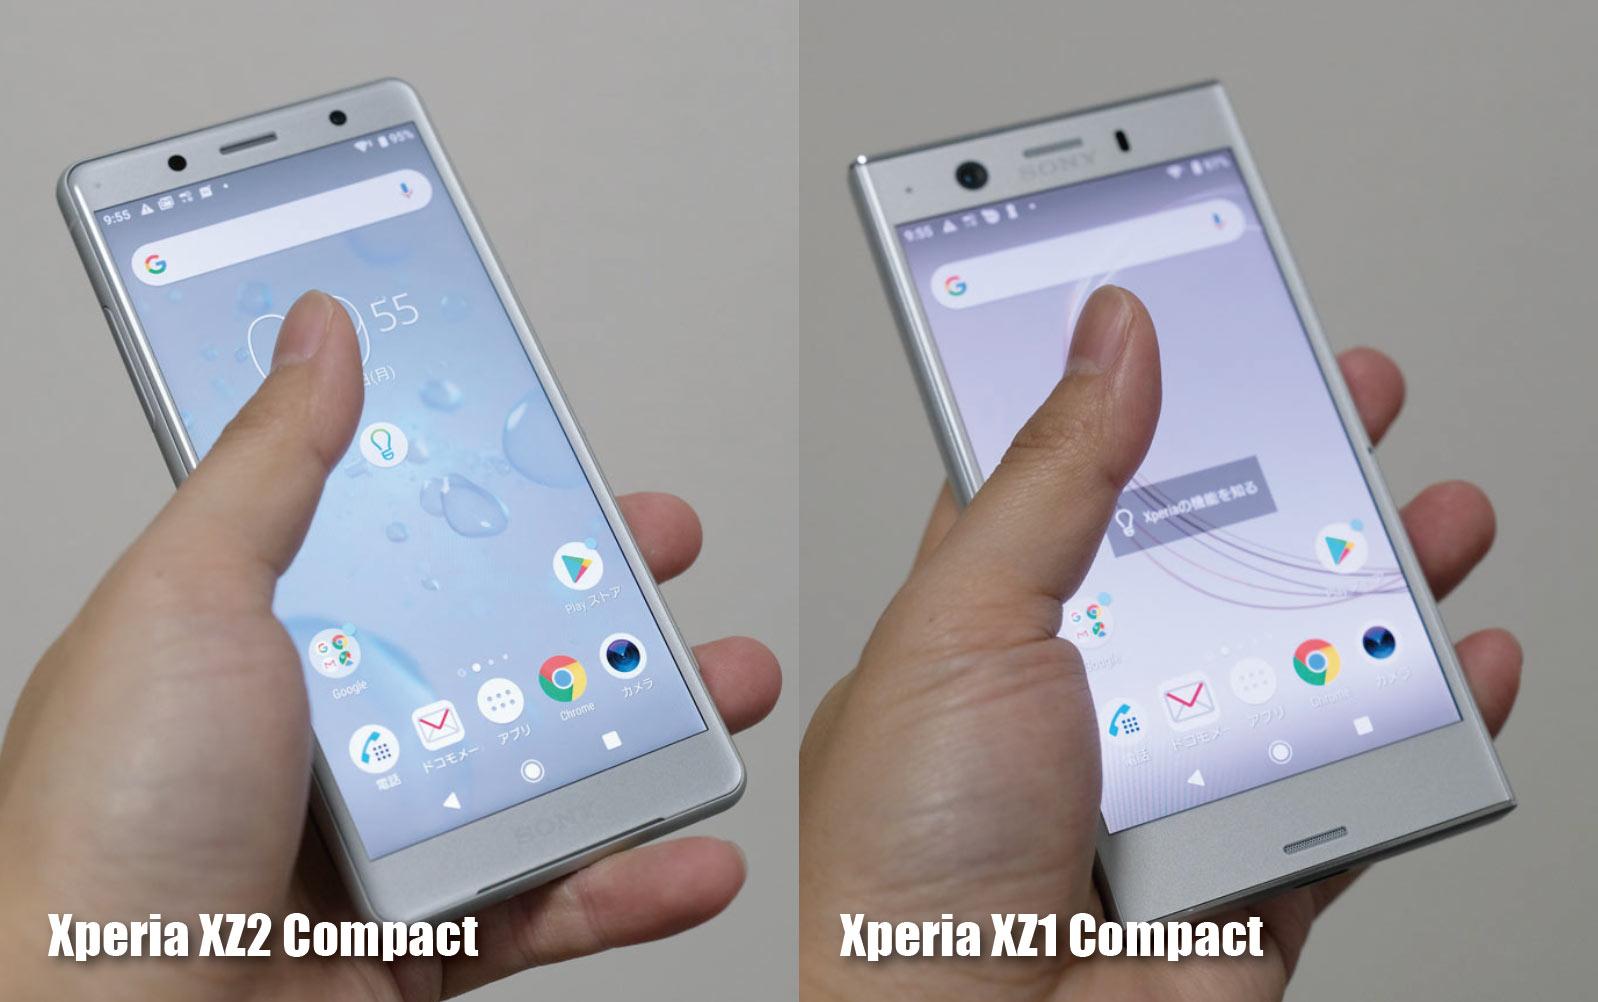 Xperia Compactシリーズの持ちやすさ